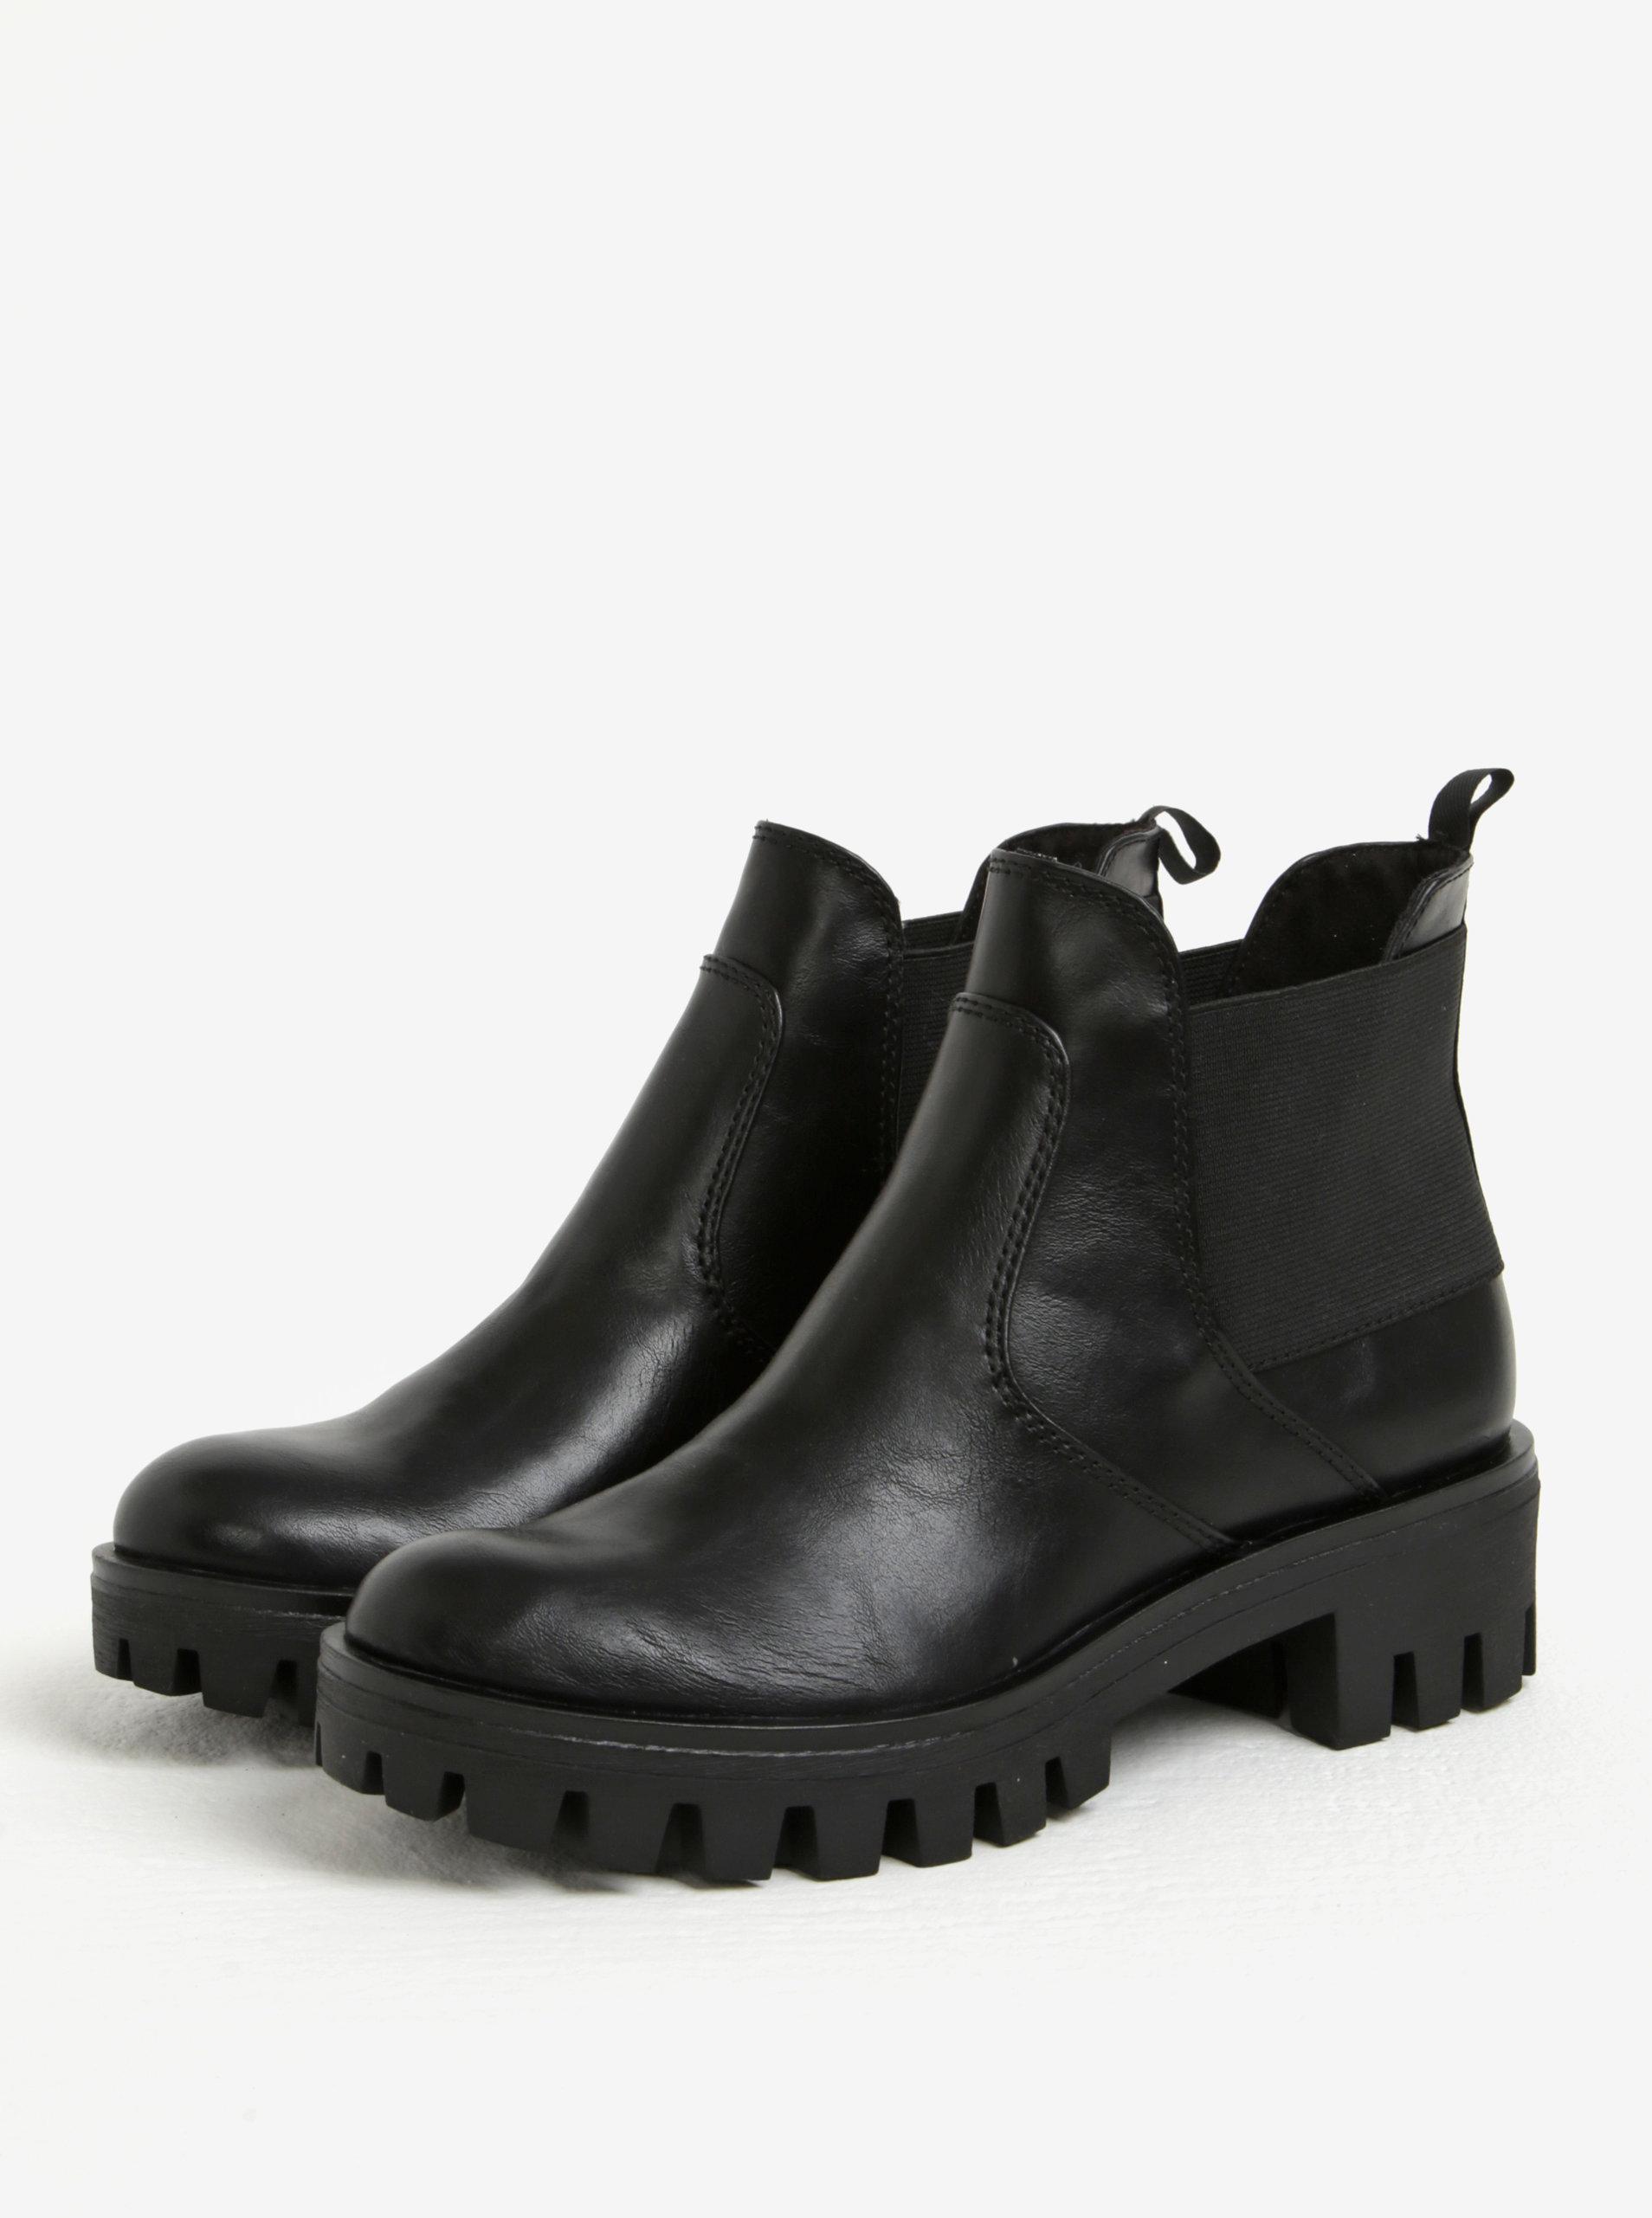 7590c96572fa Čierne chelsea topánky na nízkej platforme Tamaris ...